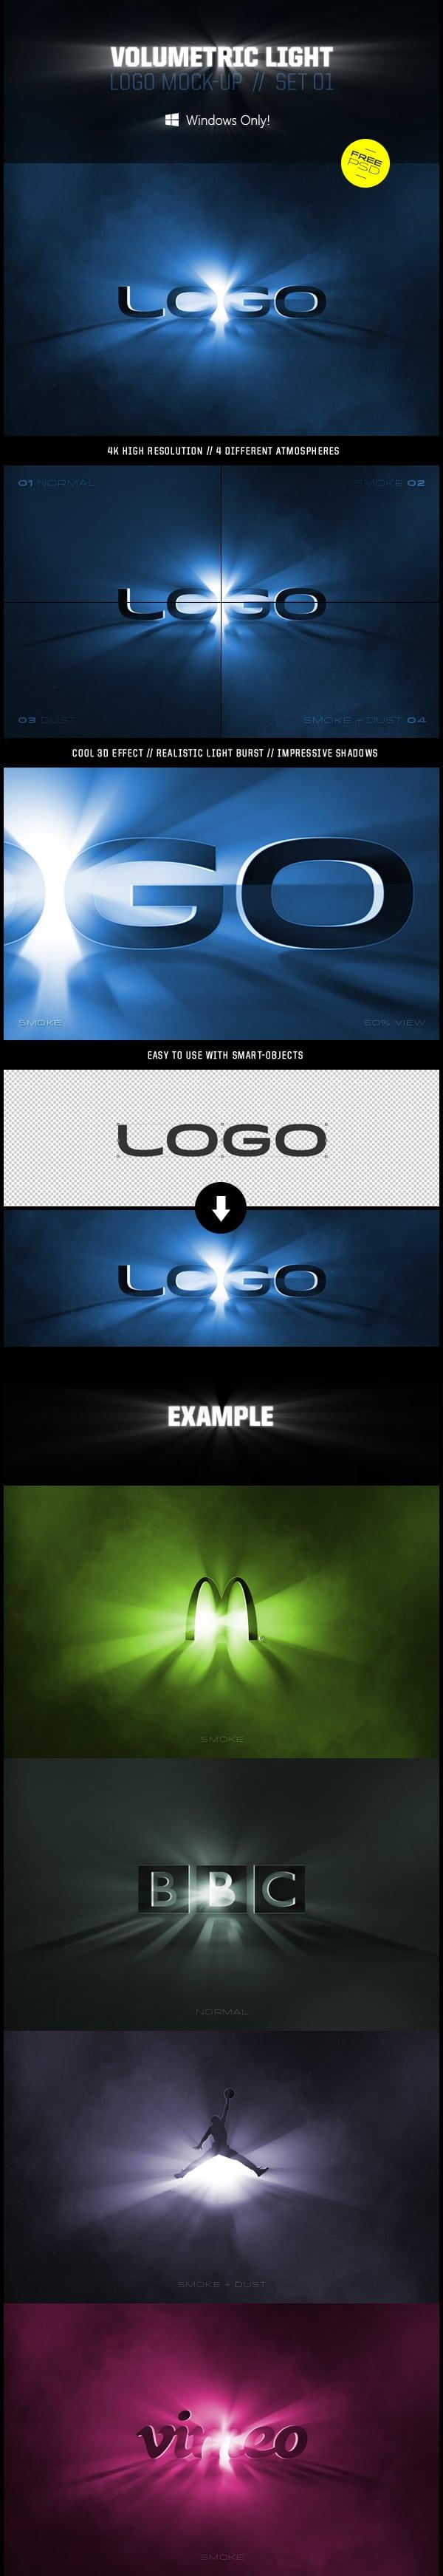 Volumetric Light Logo